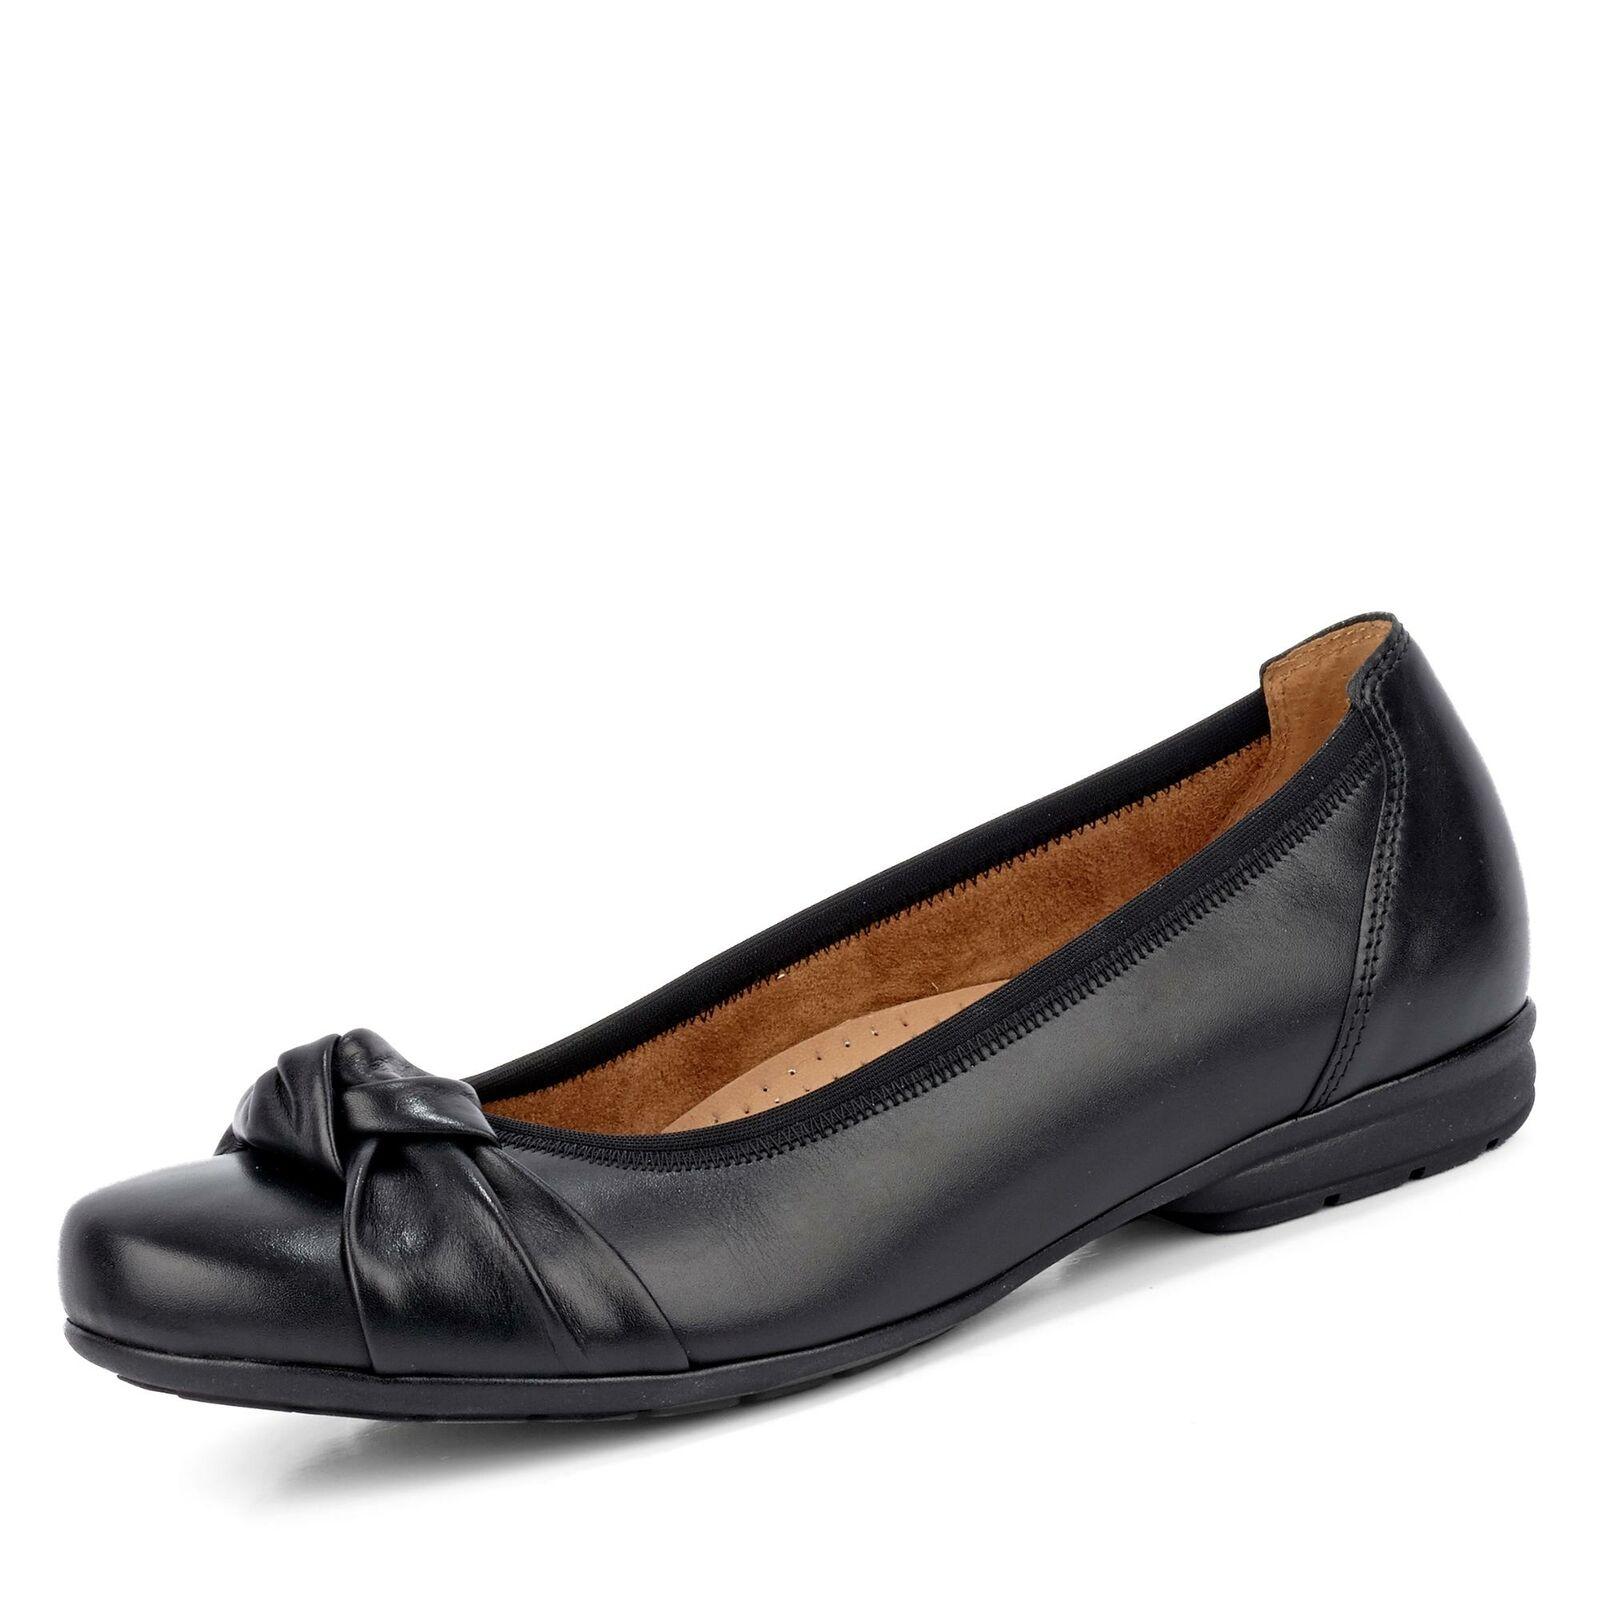 Gabor Damen Schwarz Schuhe Komfort Ballerina Ballerinas